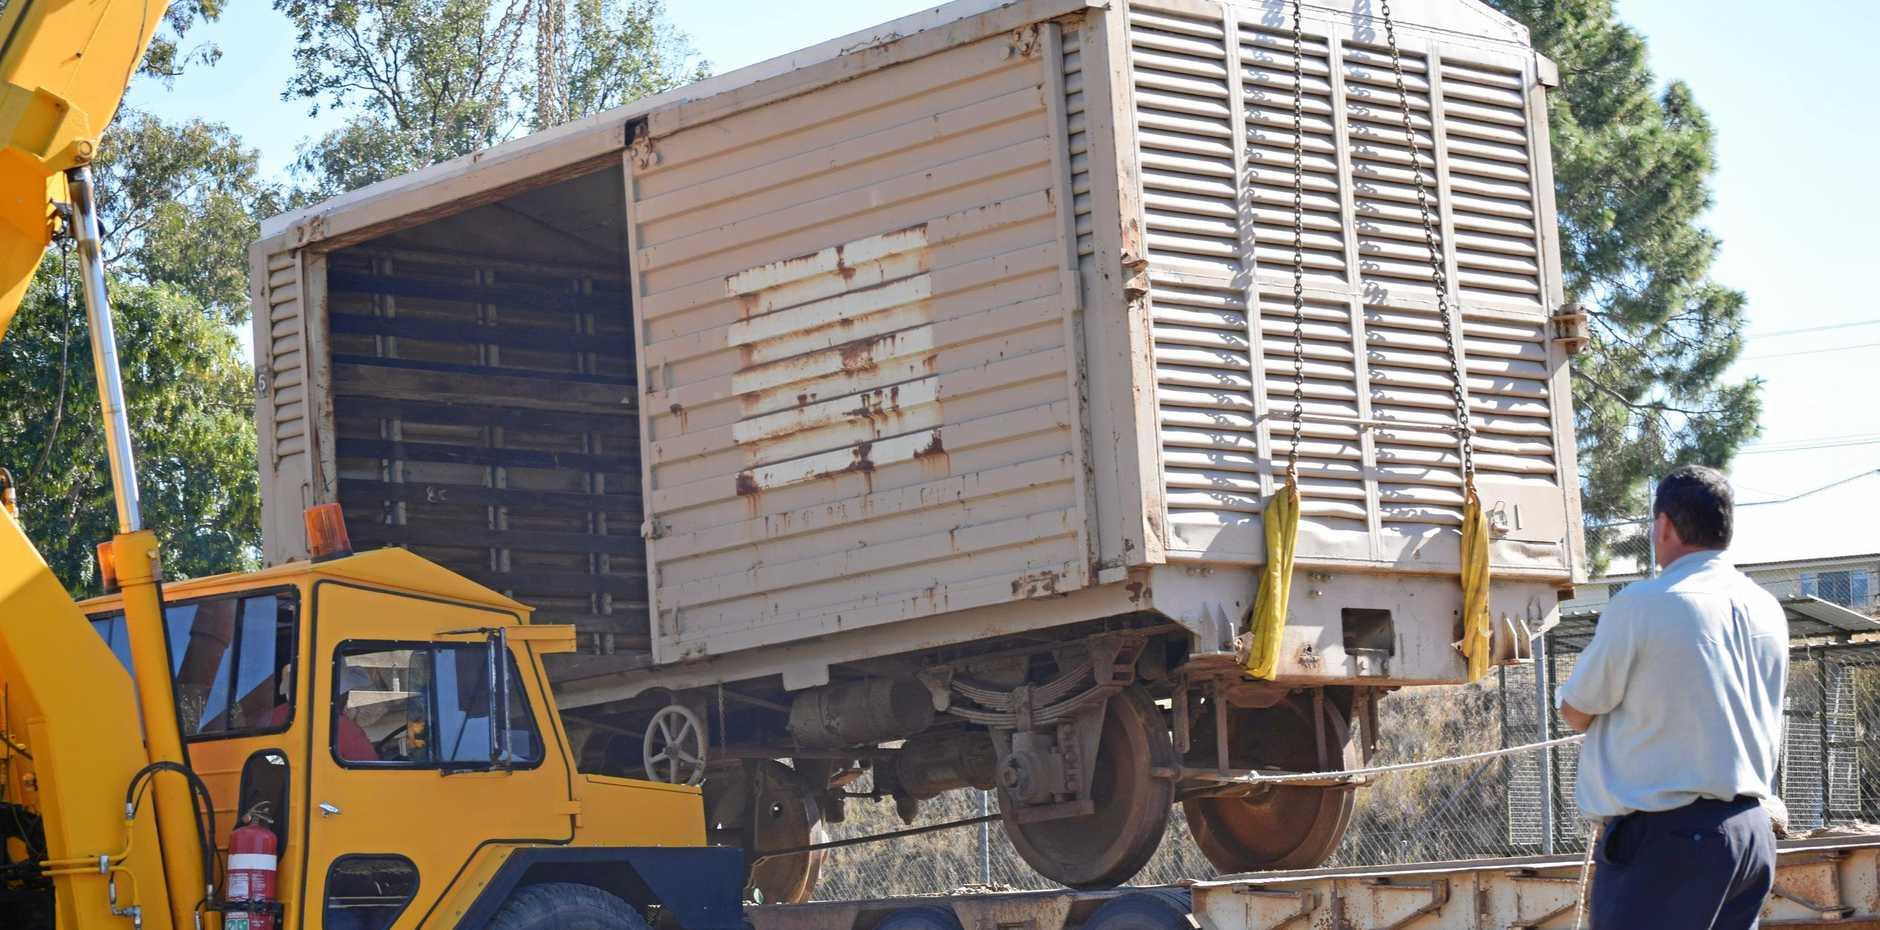 PRESERVING HISTORY: David Zipf is helping unload the railway cargo at the Mundubbera railway precinct.